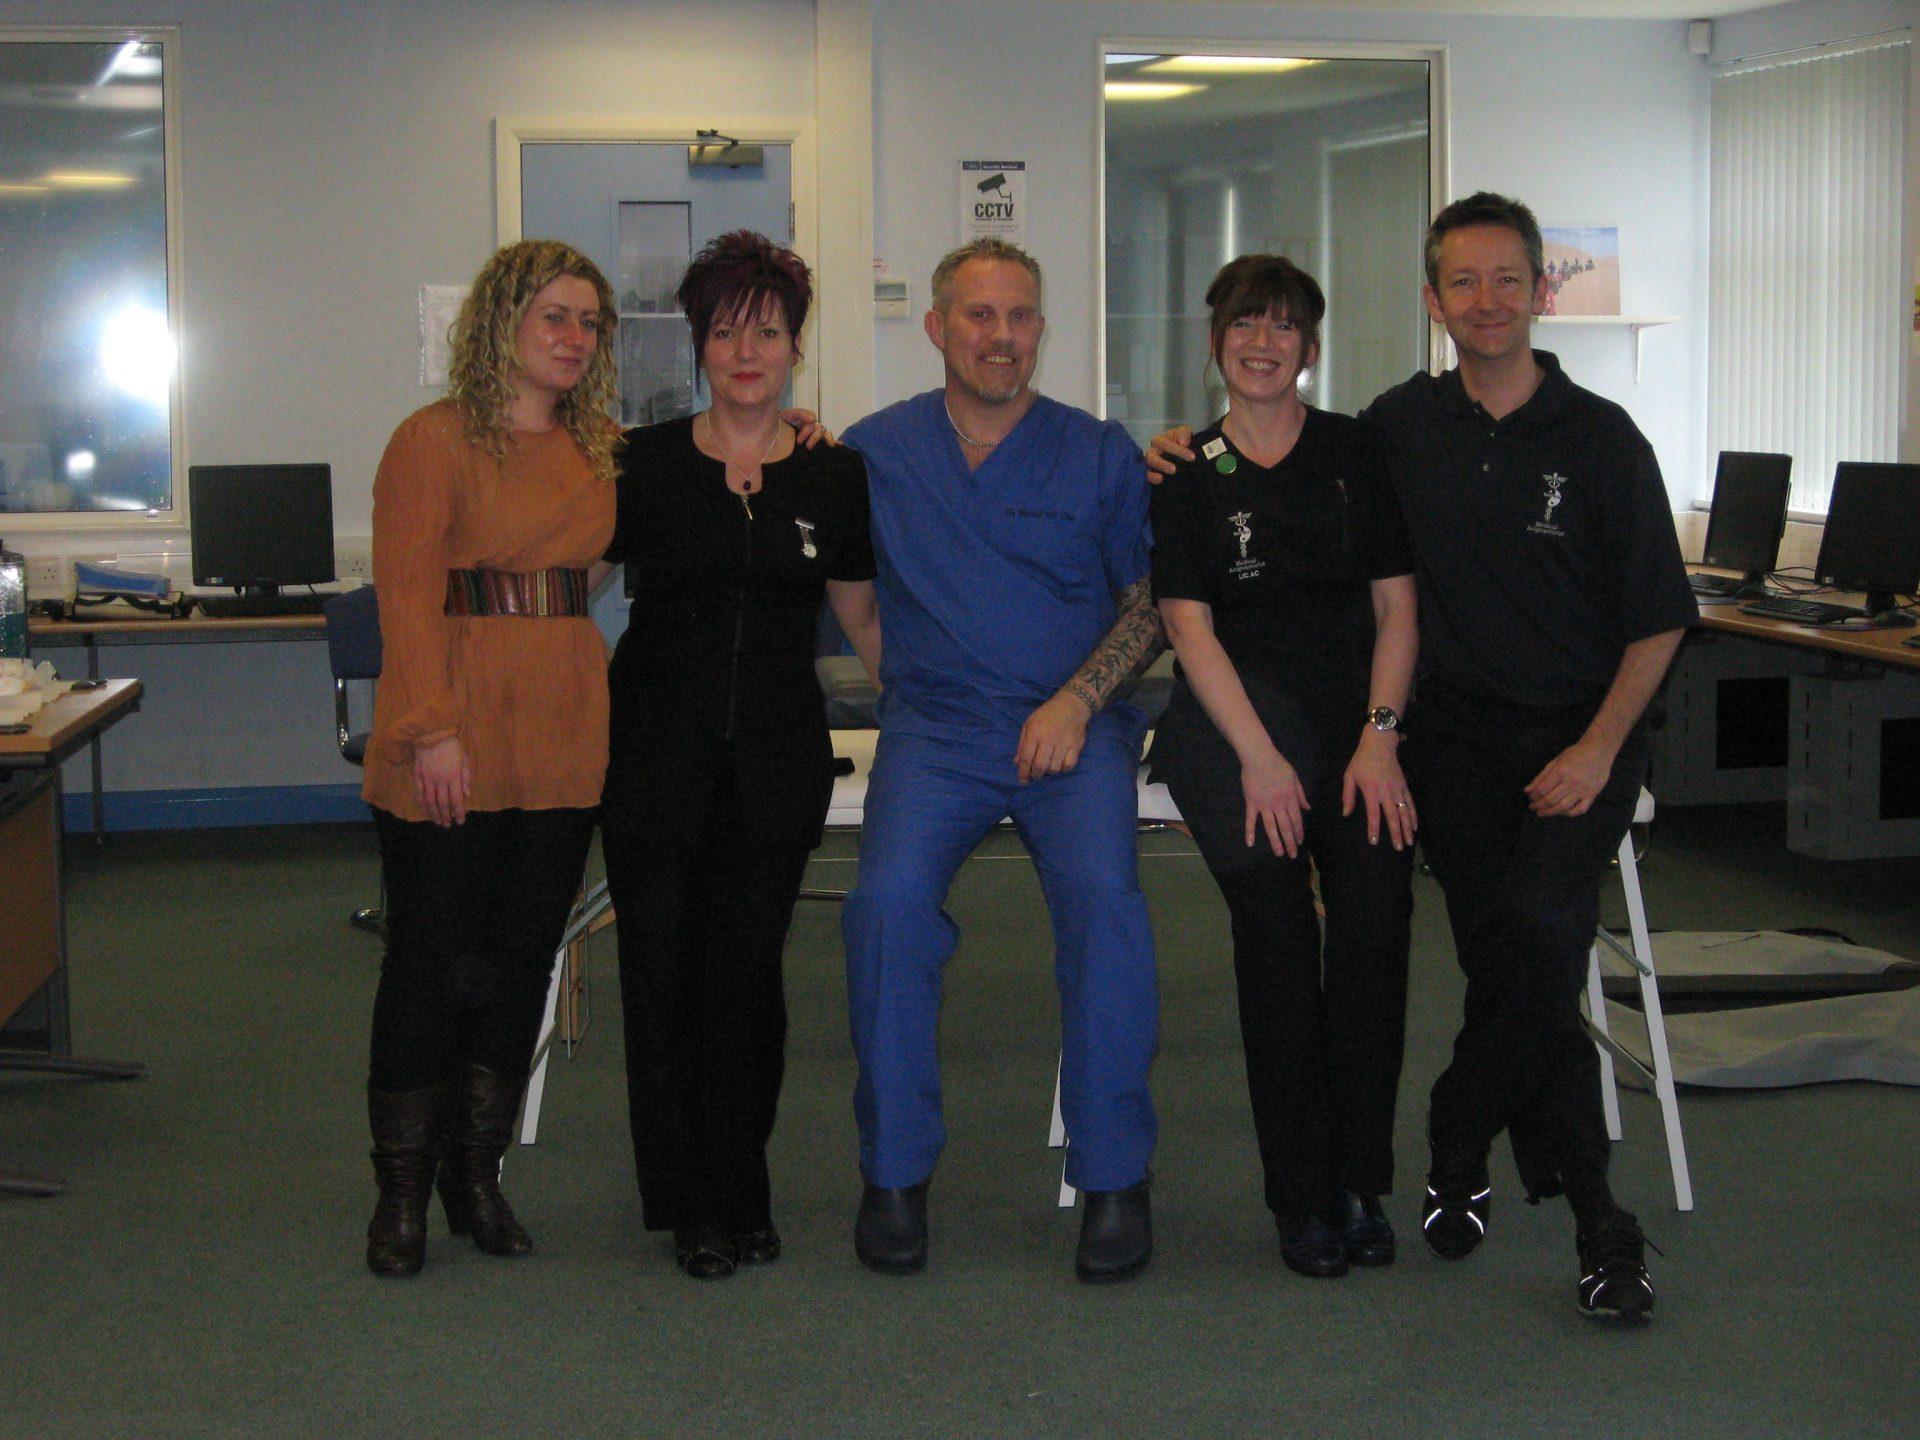 Liverpool Facial Acupuncture Workshop 2011